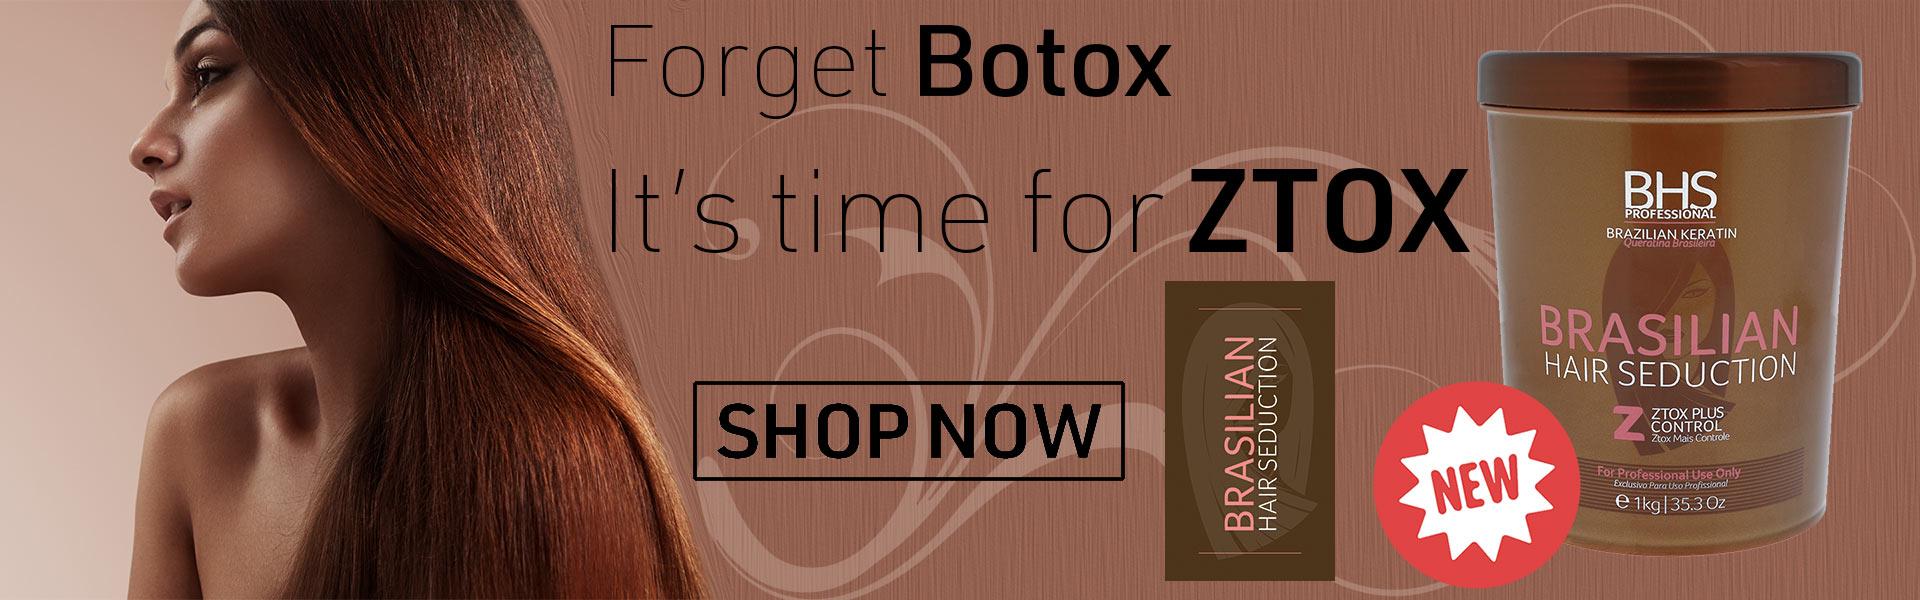 Brasilian Hair Seduction ZTOX Plus Control